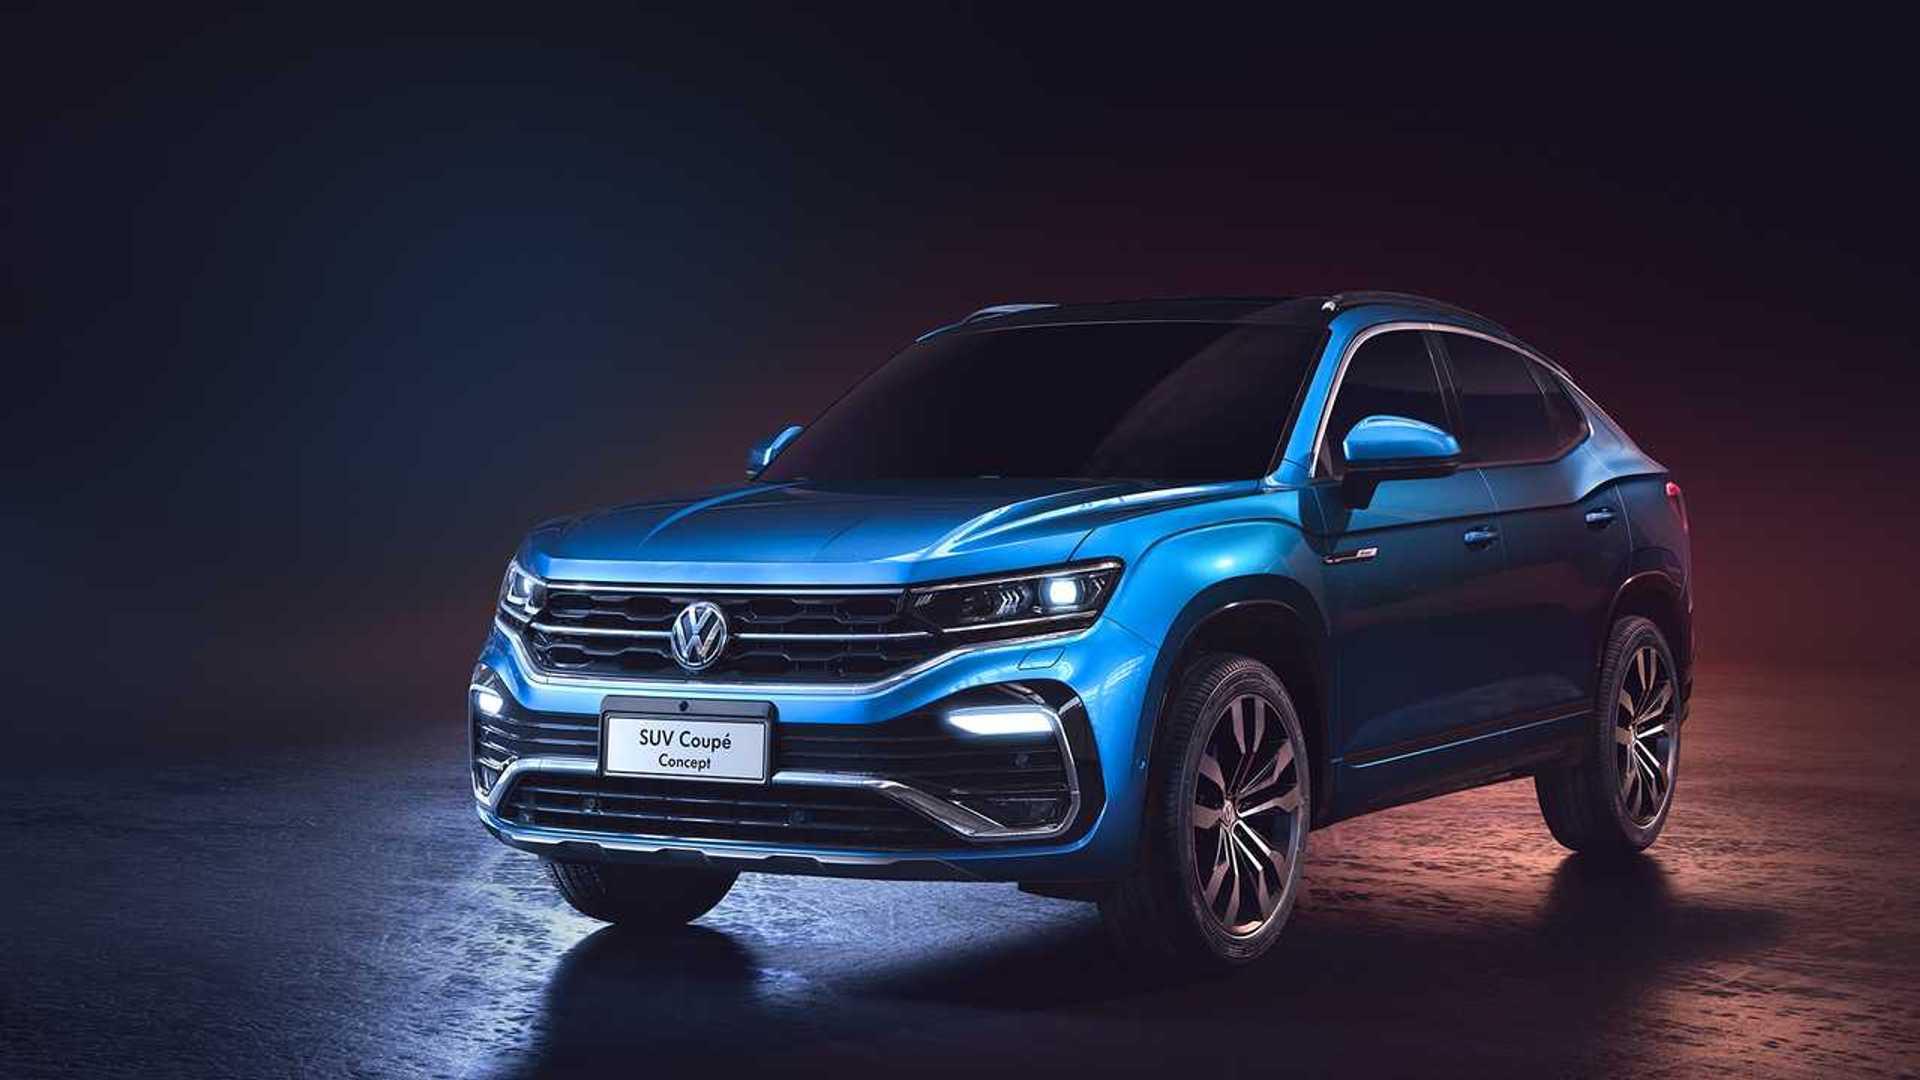 Volkswagen показал в Китае SUV Coupe Concept